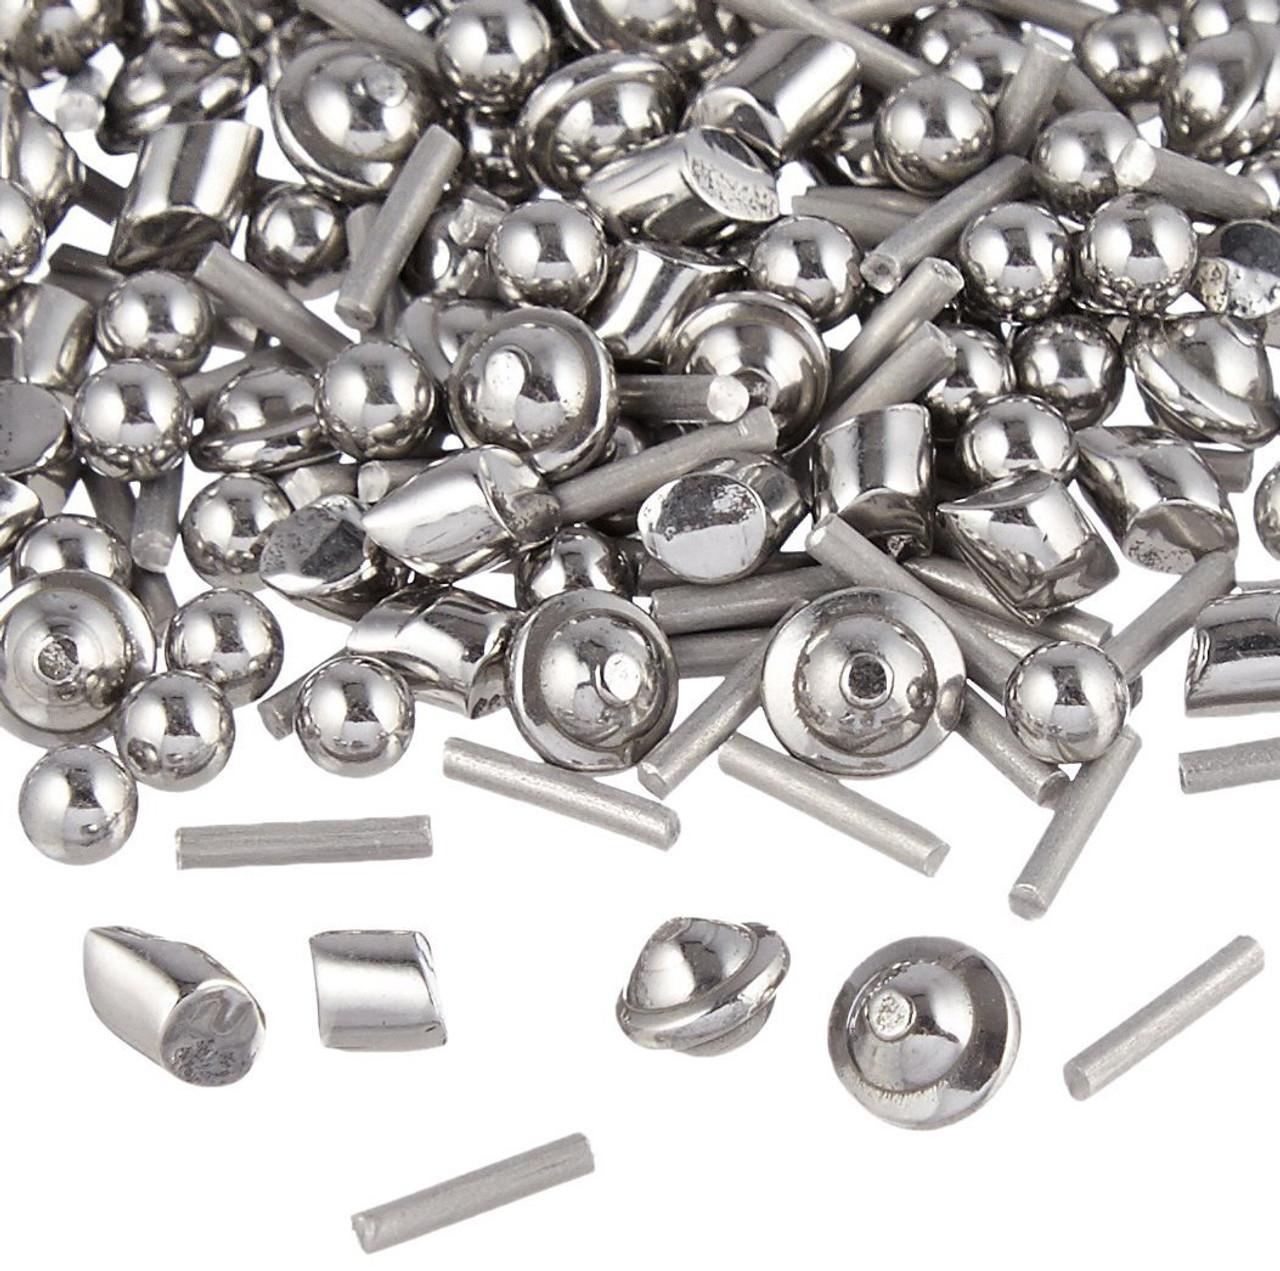 5 Lb 1//8 Stainless Steel Tumbling Media Shot Jewelers Mix 3 Shapes Tumbler Finishing